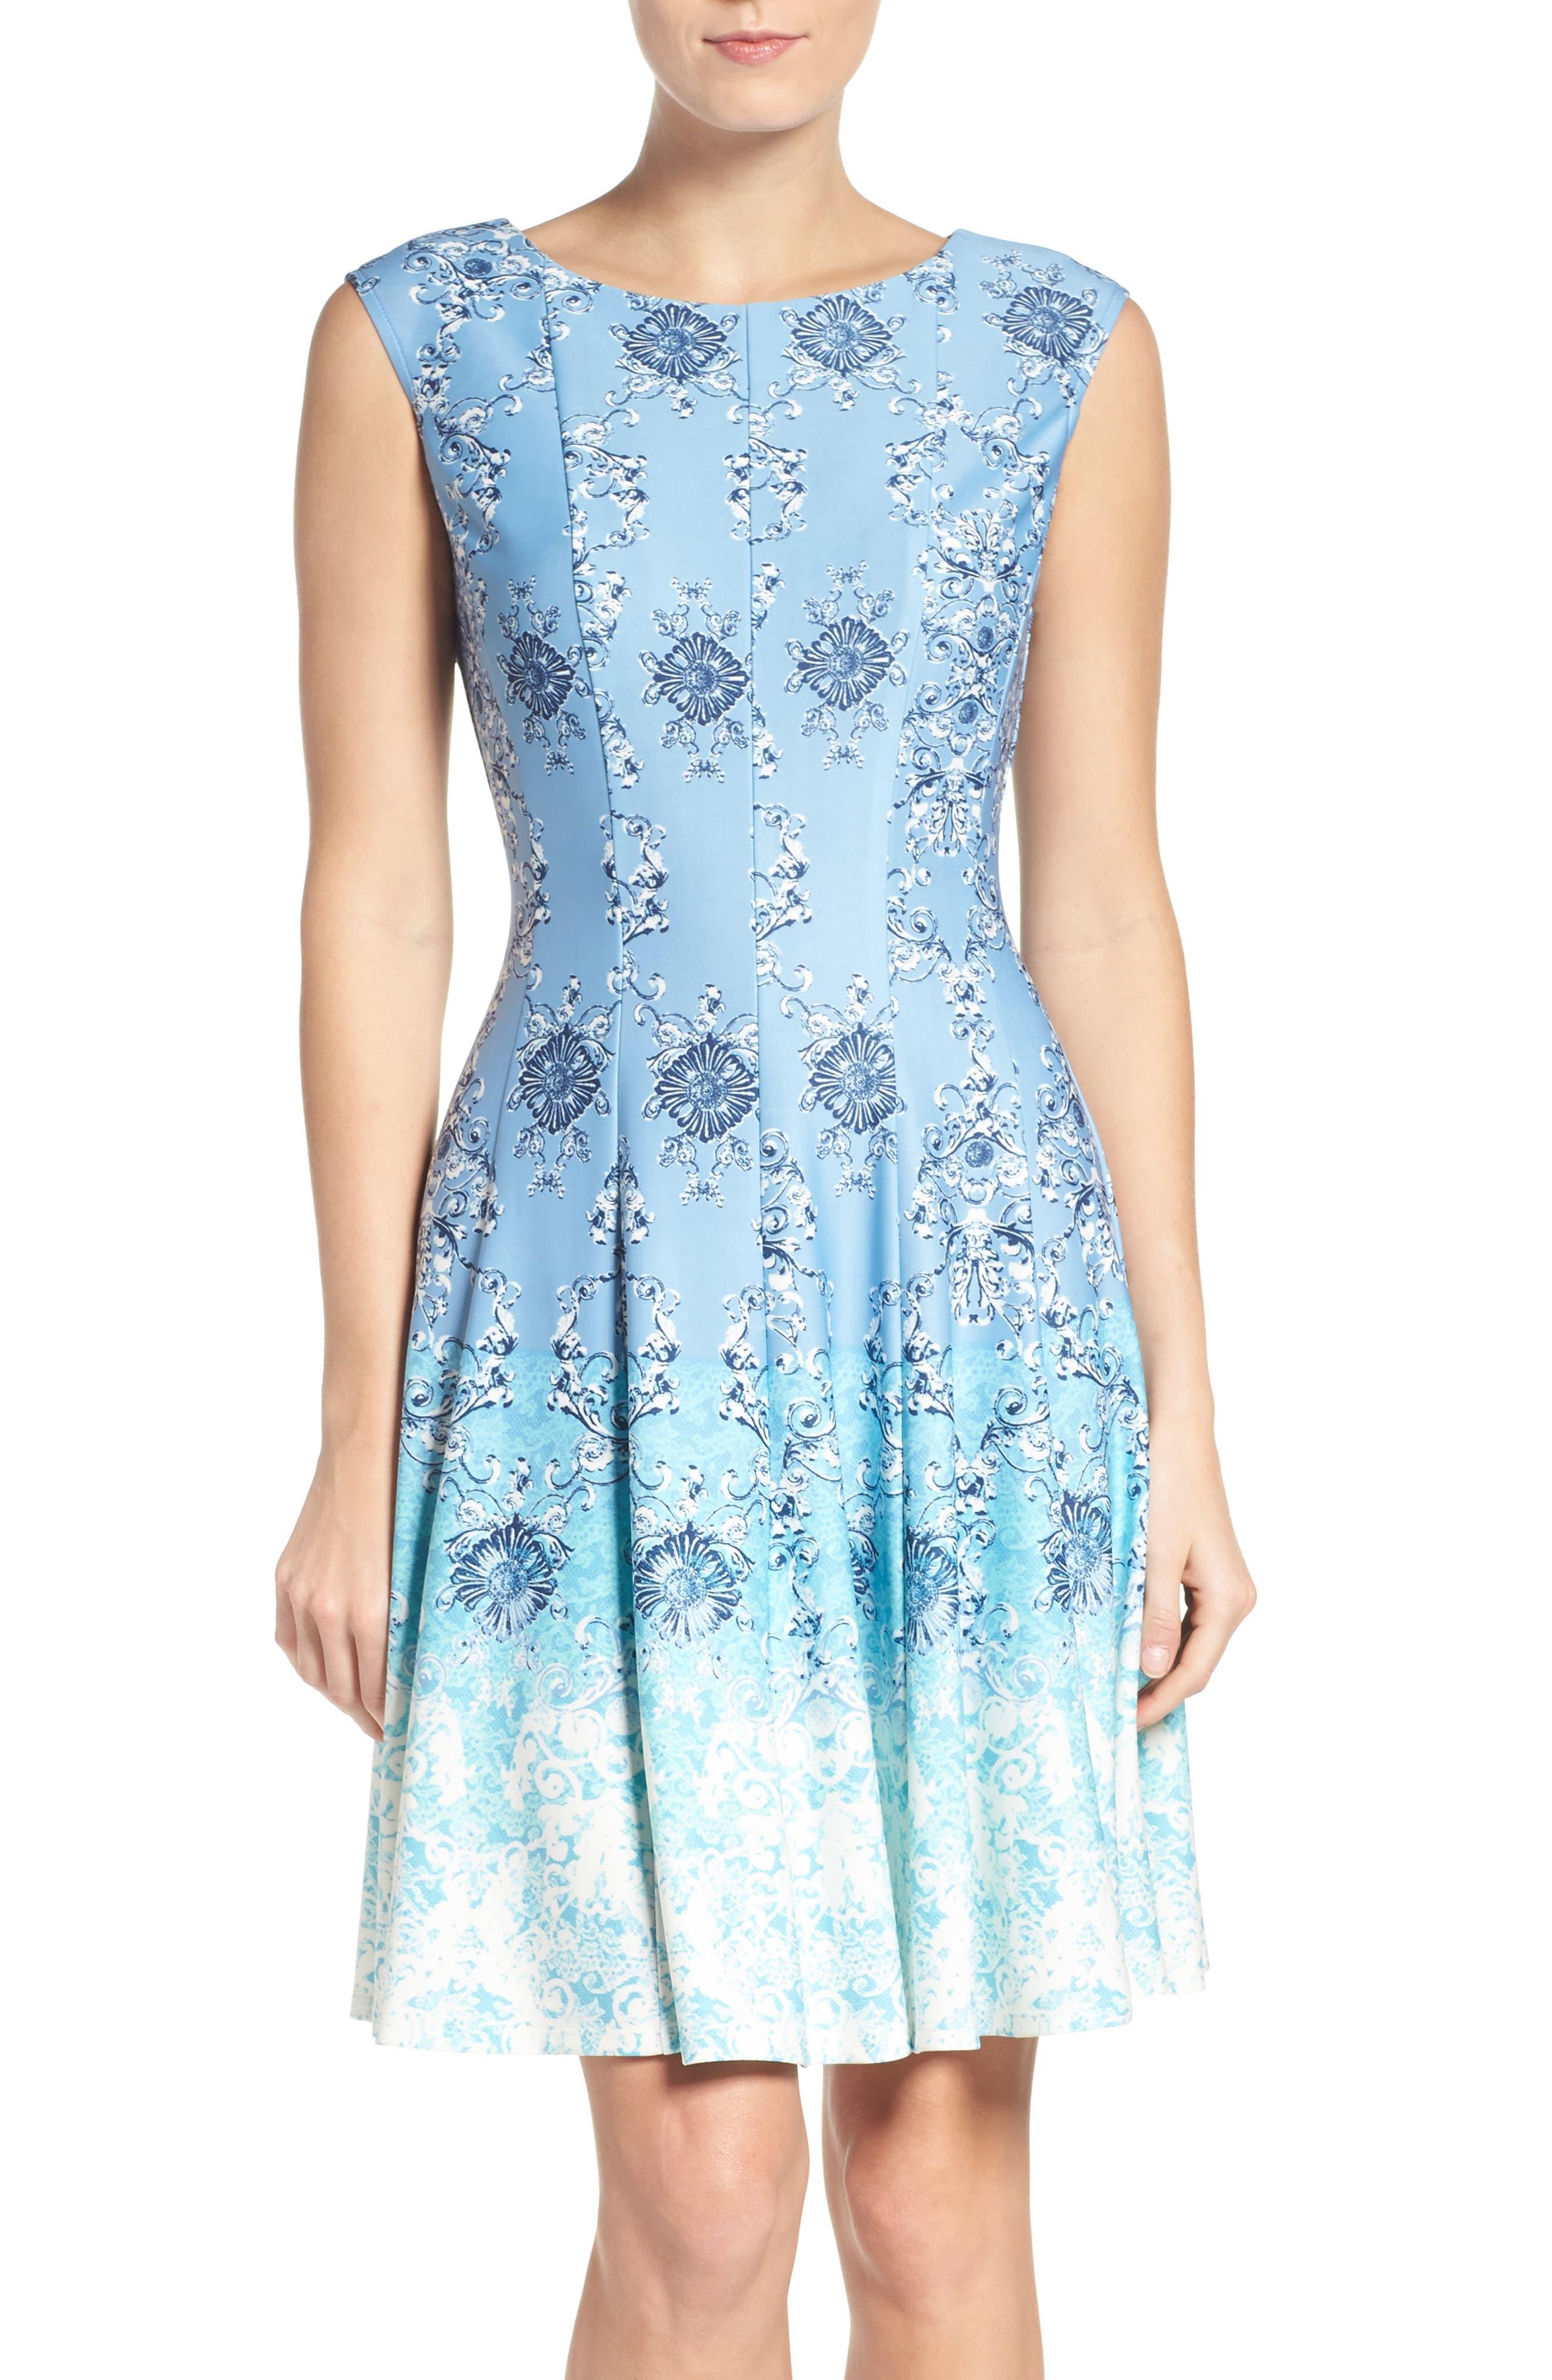 Scuba Dresses by BCB